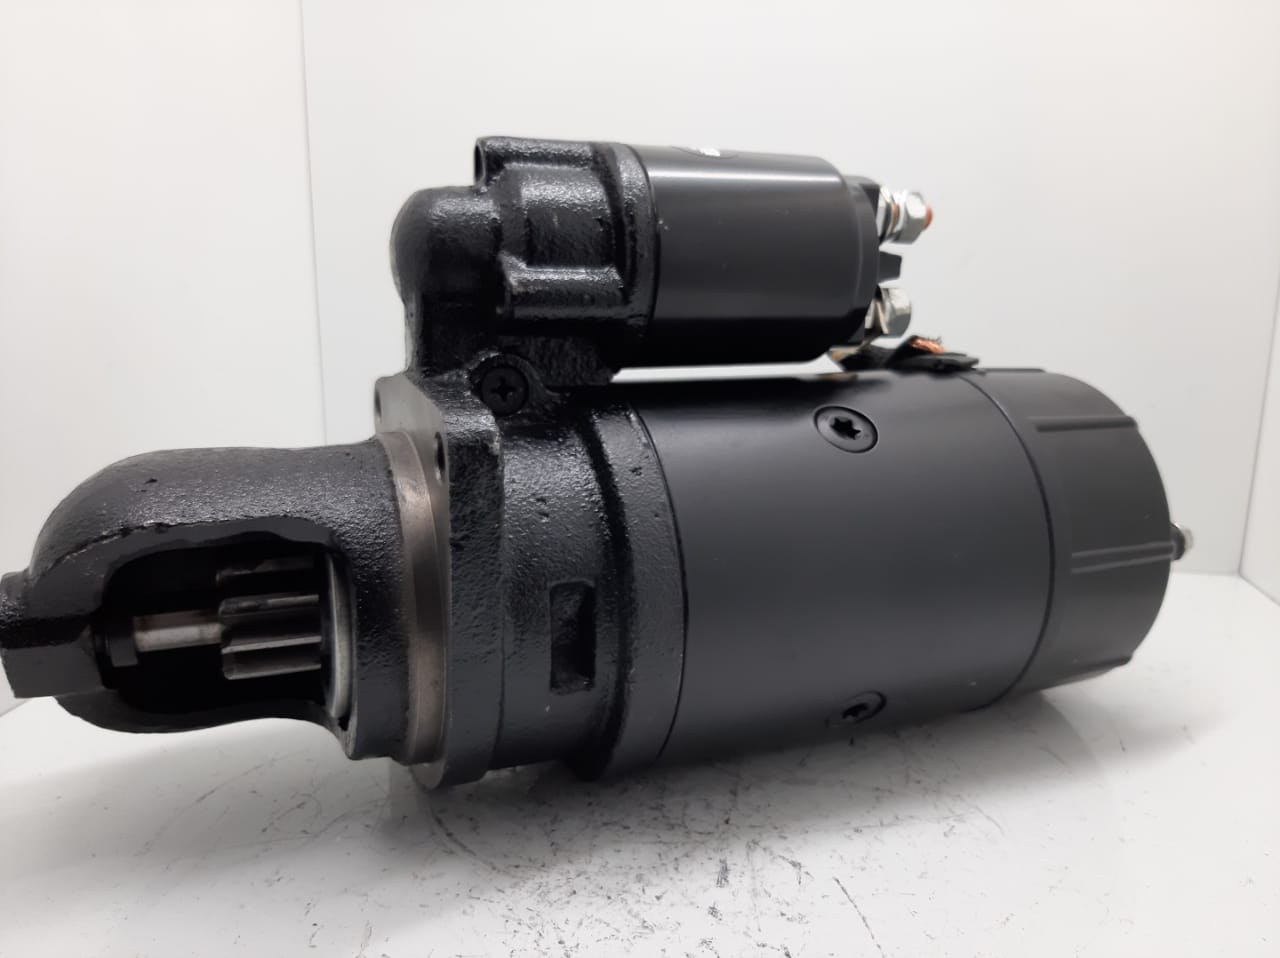 Motor de arranque MBB MANCAL EM Pé MODELO JF L124 L1217 CASE W18D W20E BOSCH 24V 9 D 0986012940 9000083064 752087601 A3431517201 12709015 E 20604 D 20216 AEC14053